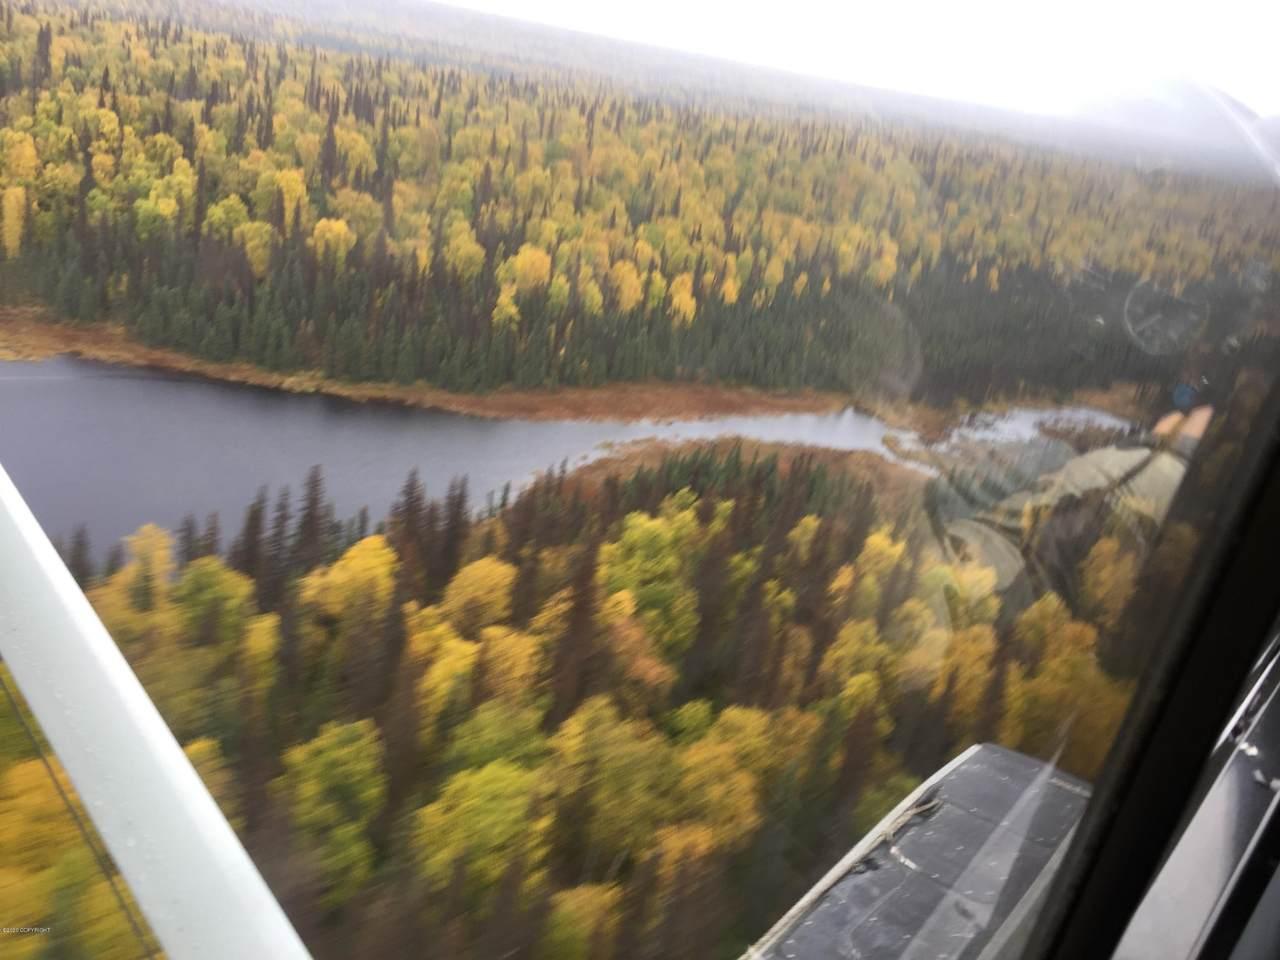 https://bt-photos.global.ssl.fastly.net/alaska/orig_boomver_2_20-12946-2.jpg